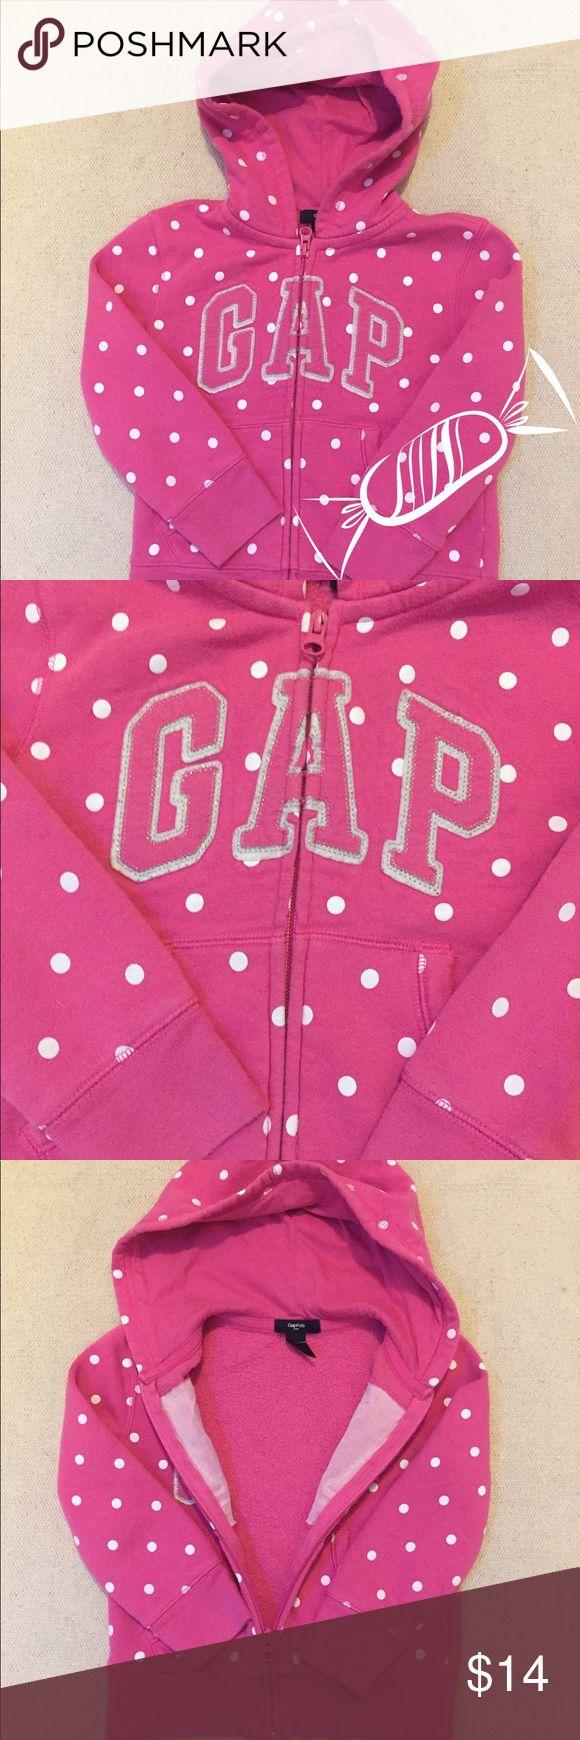 🌟$7 if bundle 2🌟Gap Pink Zip Up Hoodie Body is 77% Cotton & 23% Polyester. Hood Lining is 100% Cotton GAP Shirts & Tops Sweatshirts & Hoodies